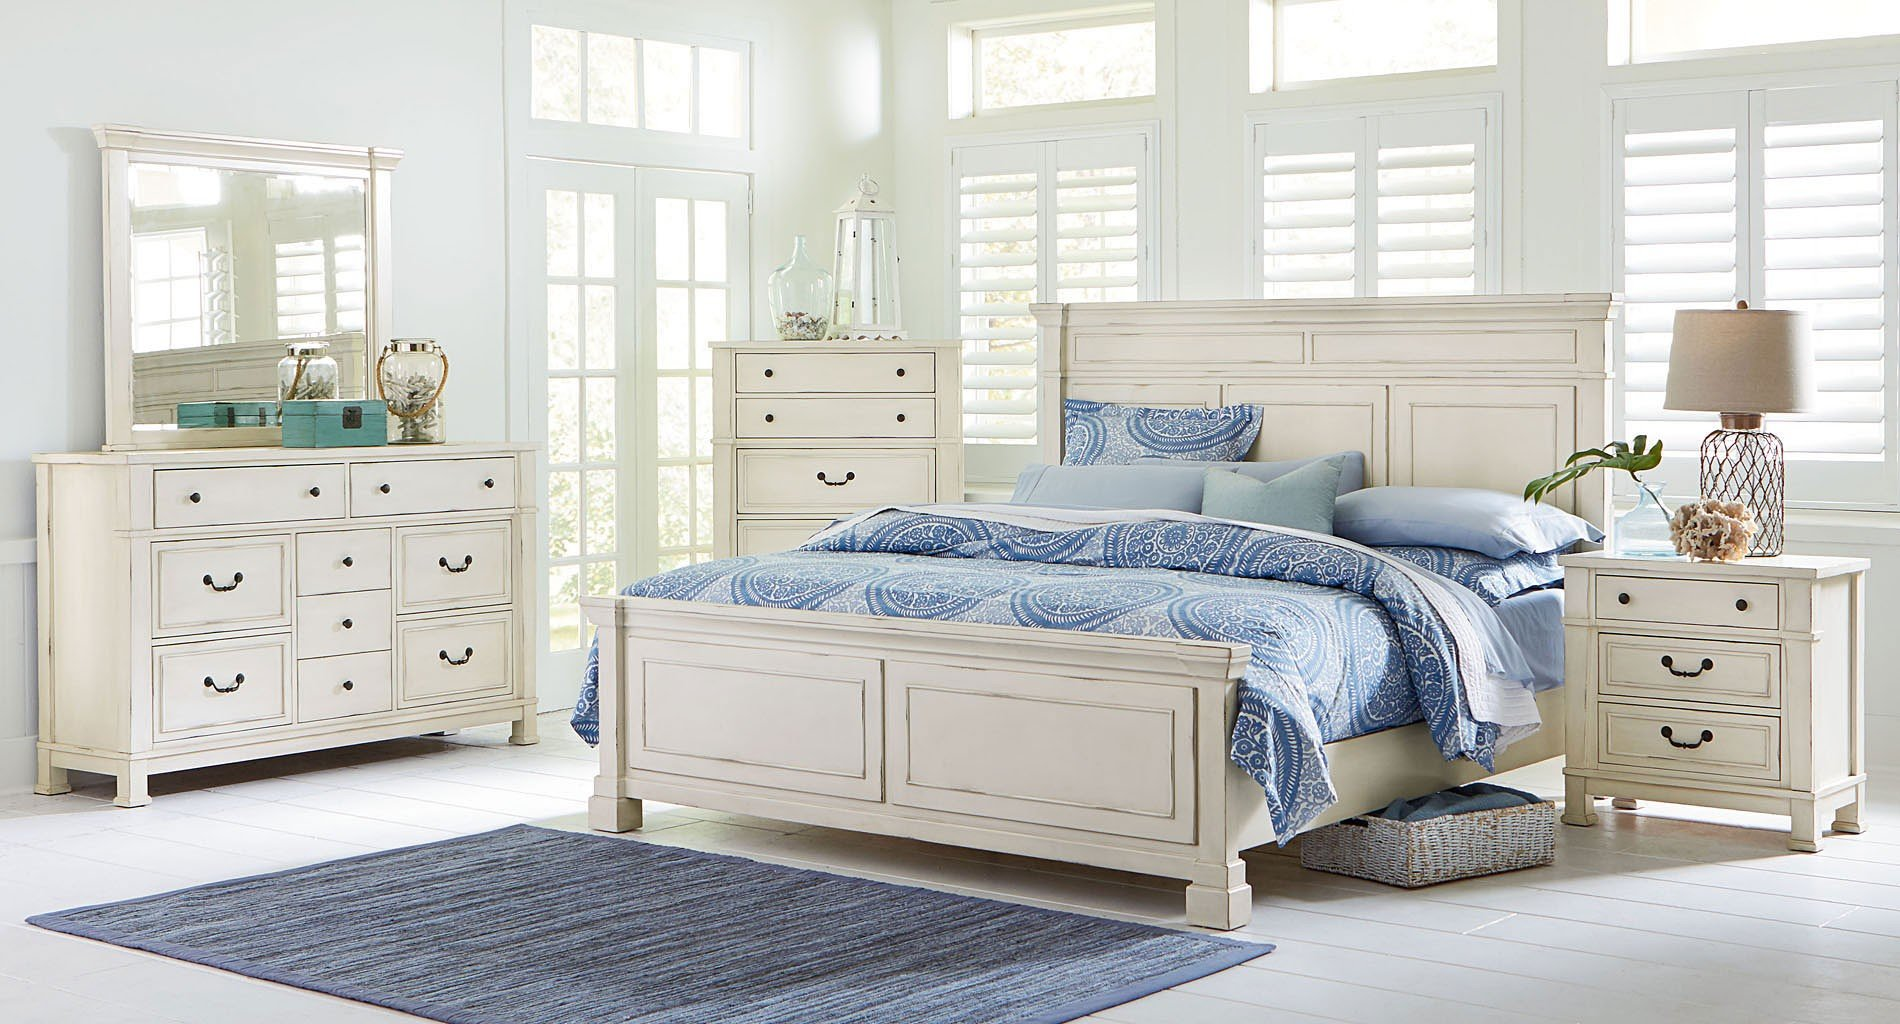 chesapeake bay panel bedroom set standard furniture furniture cart